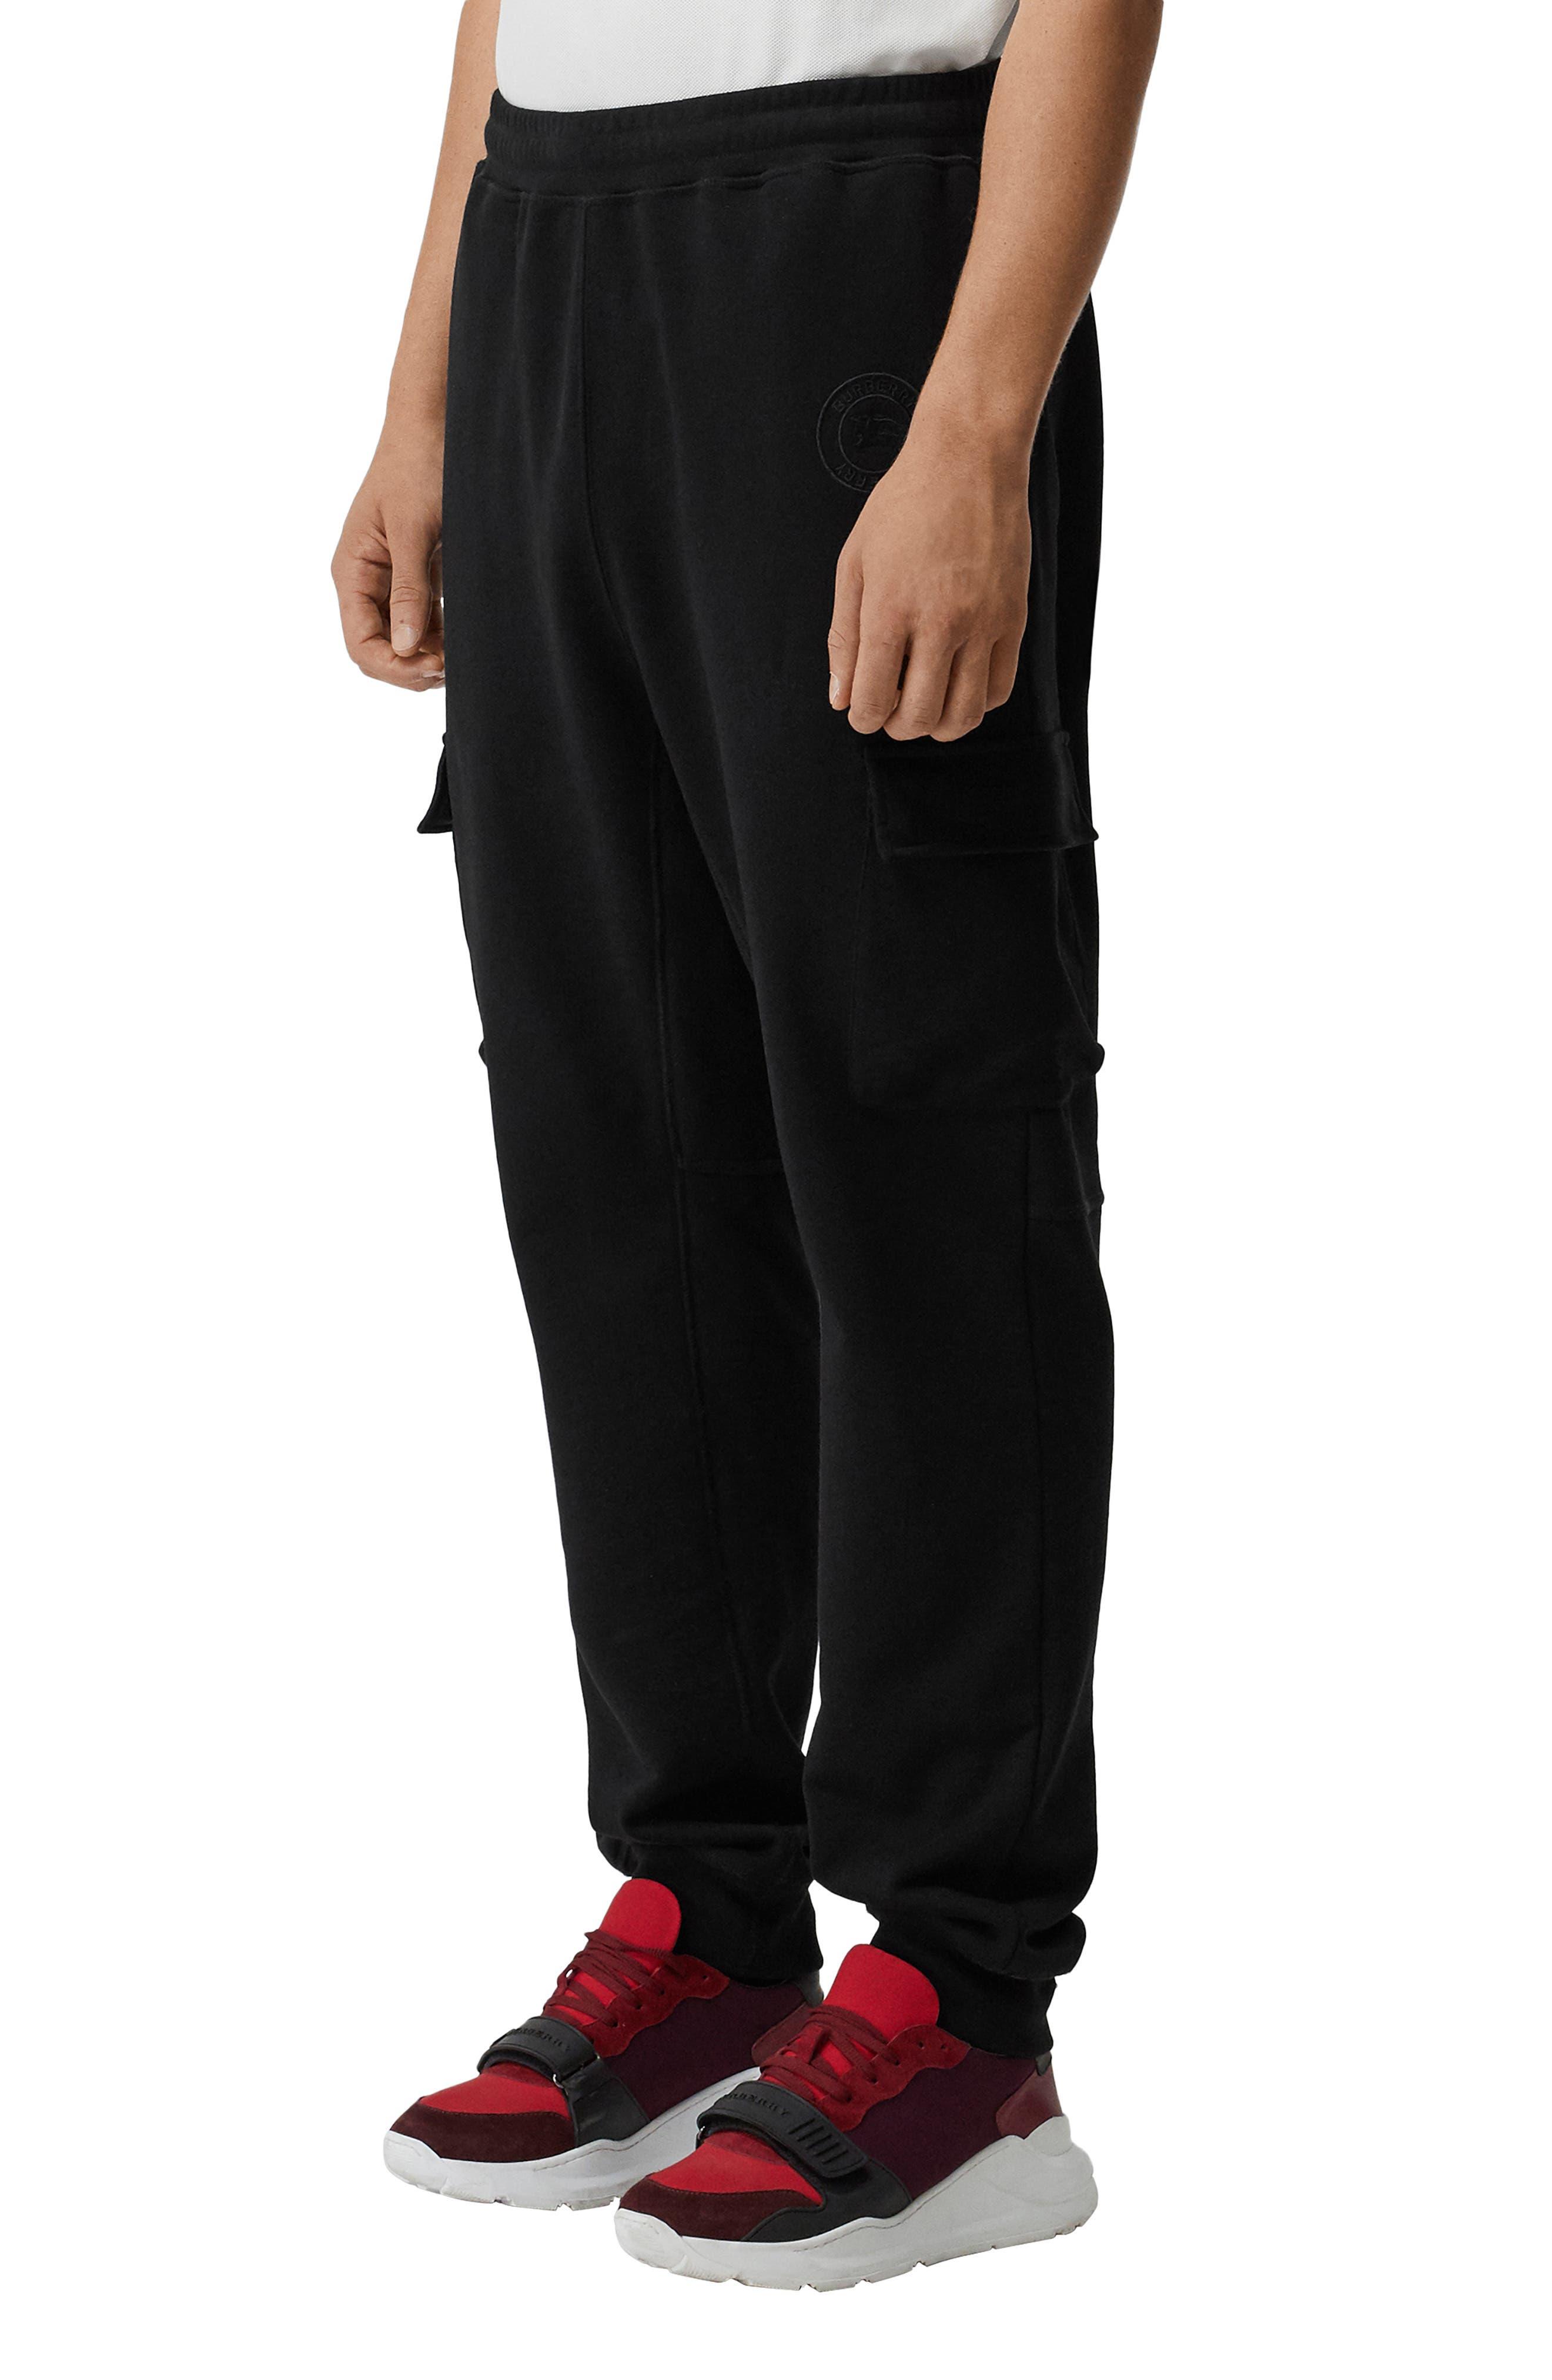 Burberry Justley Cargo Jogger Pants, Black